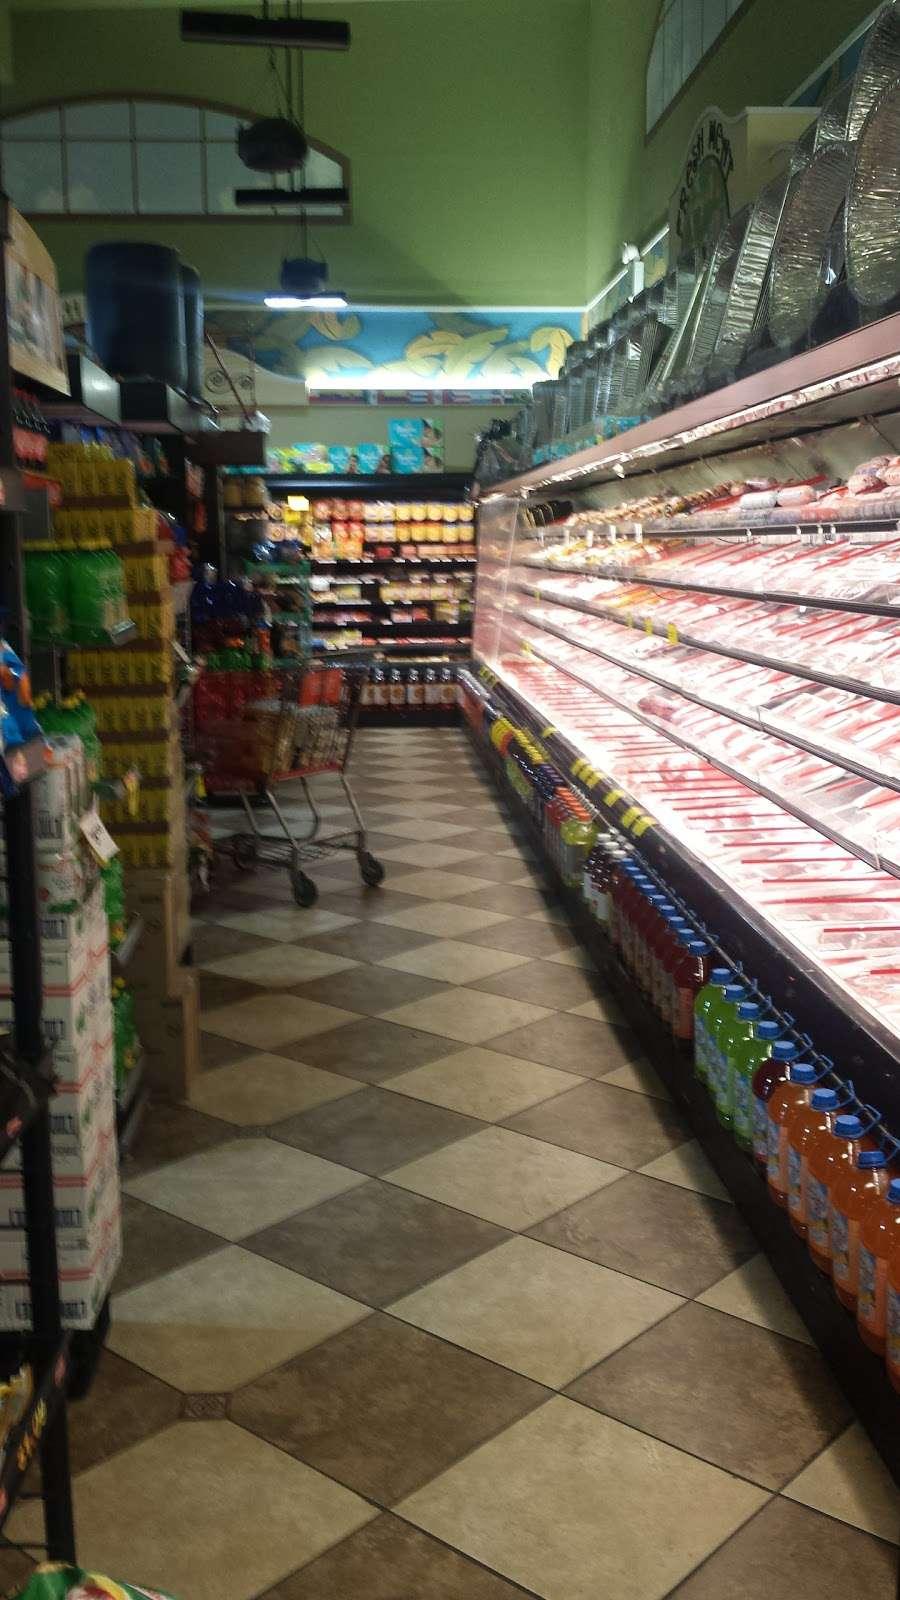 Mi Tierra Supermarket - supermarket    Photo 4 of 4   Address: 3266 97th St, Flushing, NY 11369, USA   Phone: (718) 446-0579